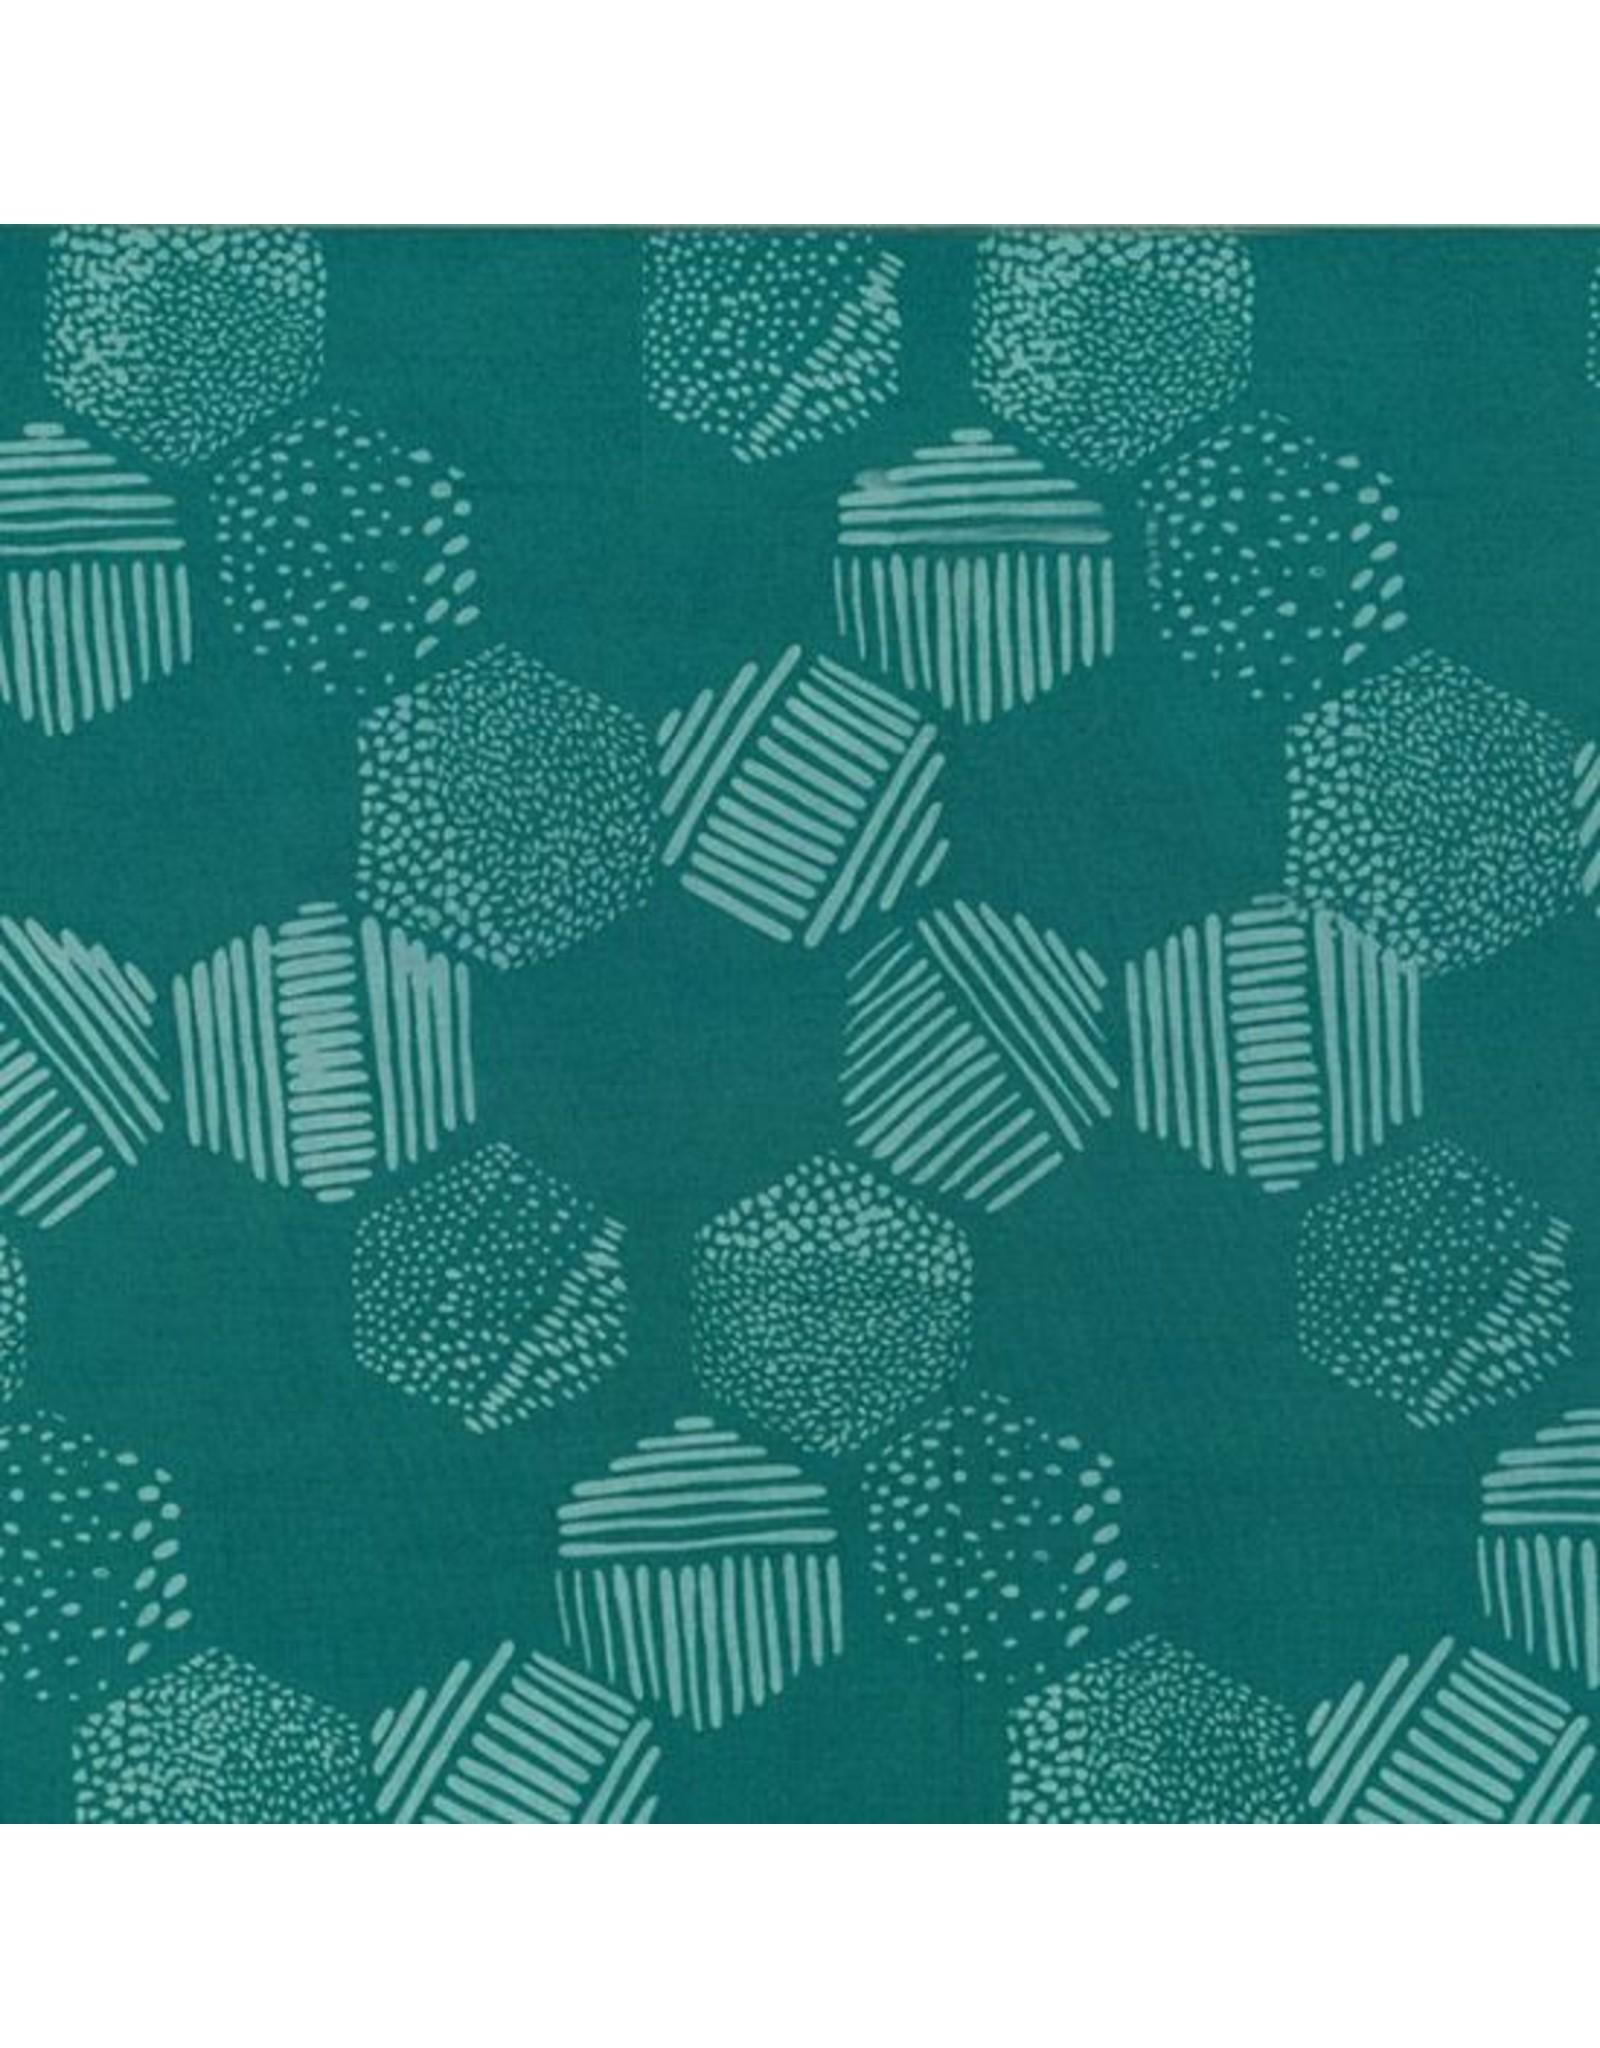 Me+You by Hoffman Fabrics Indah Batiks - 180-Dusty Teal